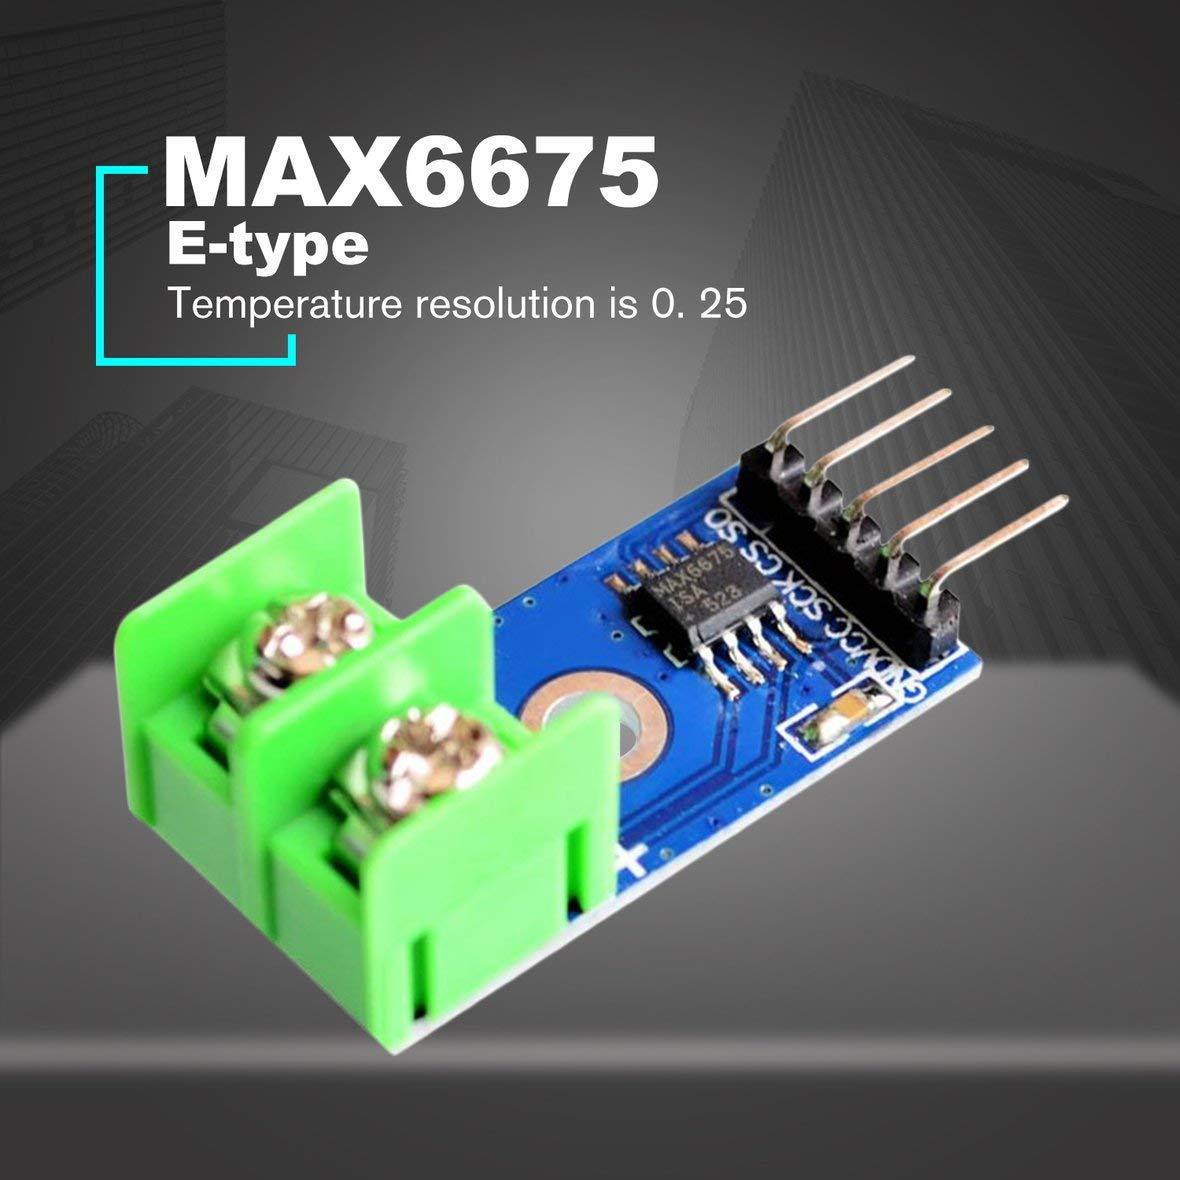 BLUE/&GREEN MAX6675 E-Type Thermocouple Temperature Sensor Thermometer Temp Module Kit Board Probe for Arduino 0℃-1024℃ Electronic DIY